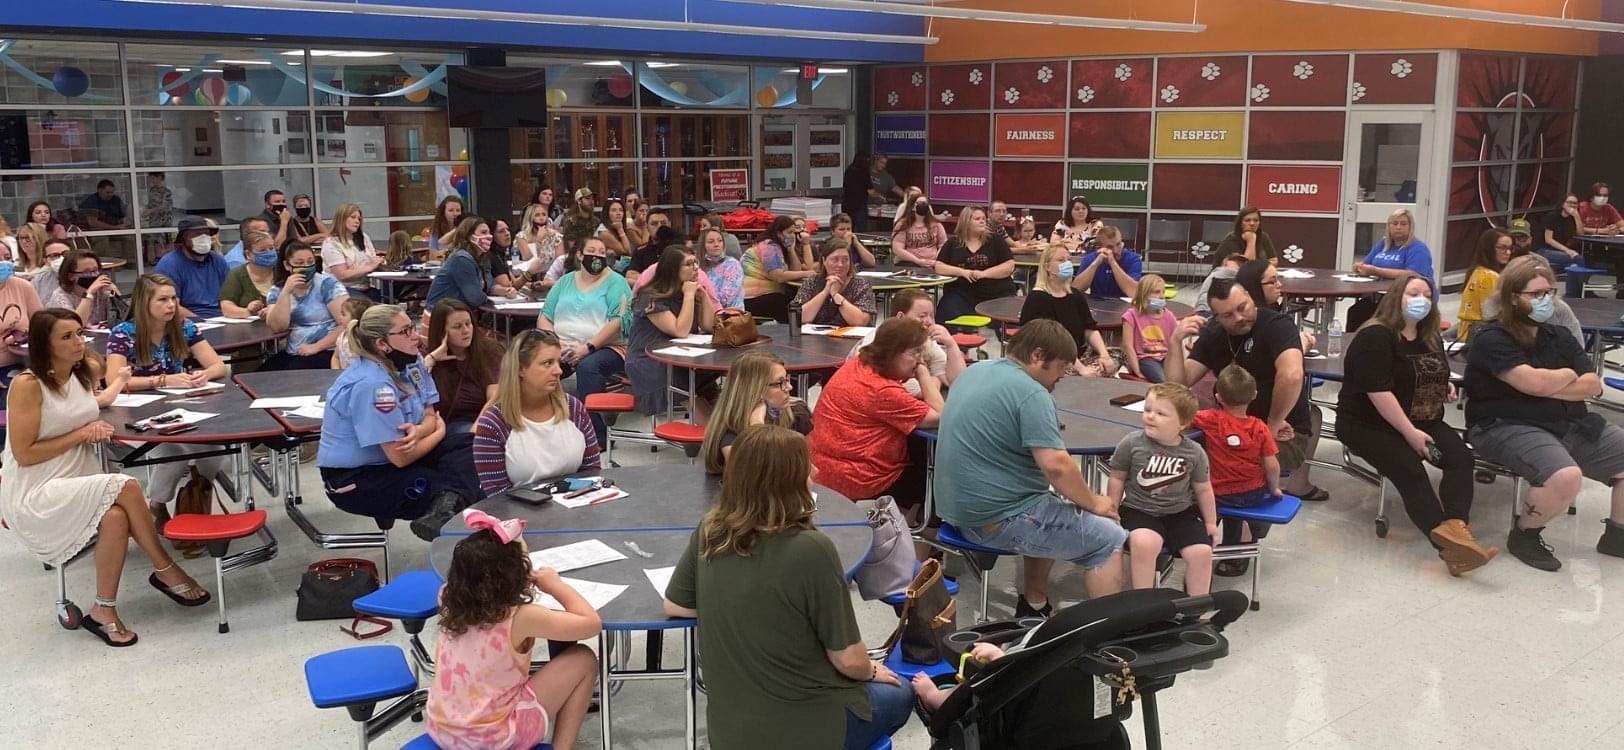 Parents warned of possible COVID exposure at kindergarten  camp